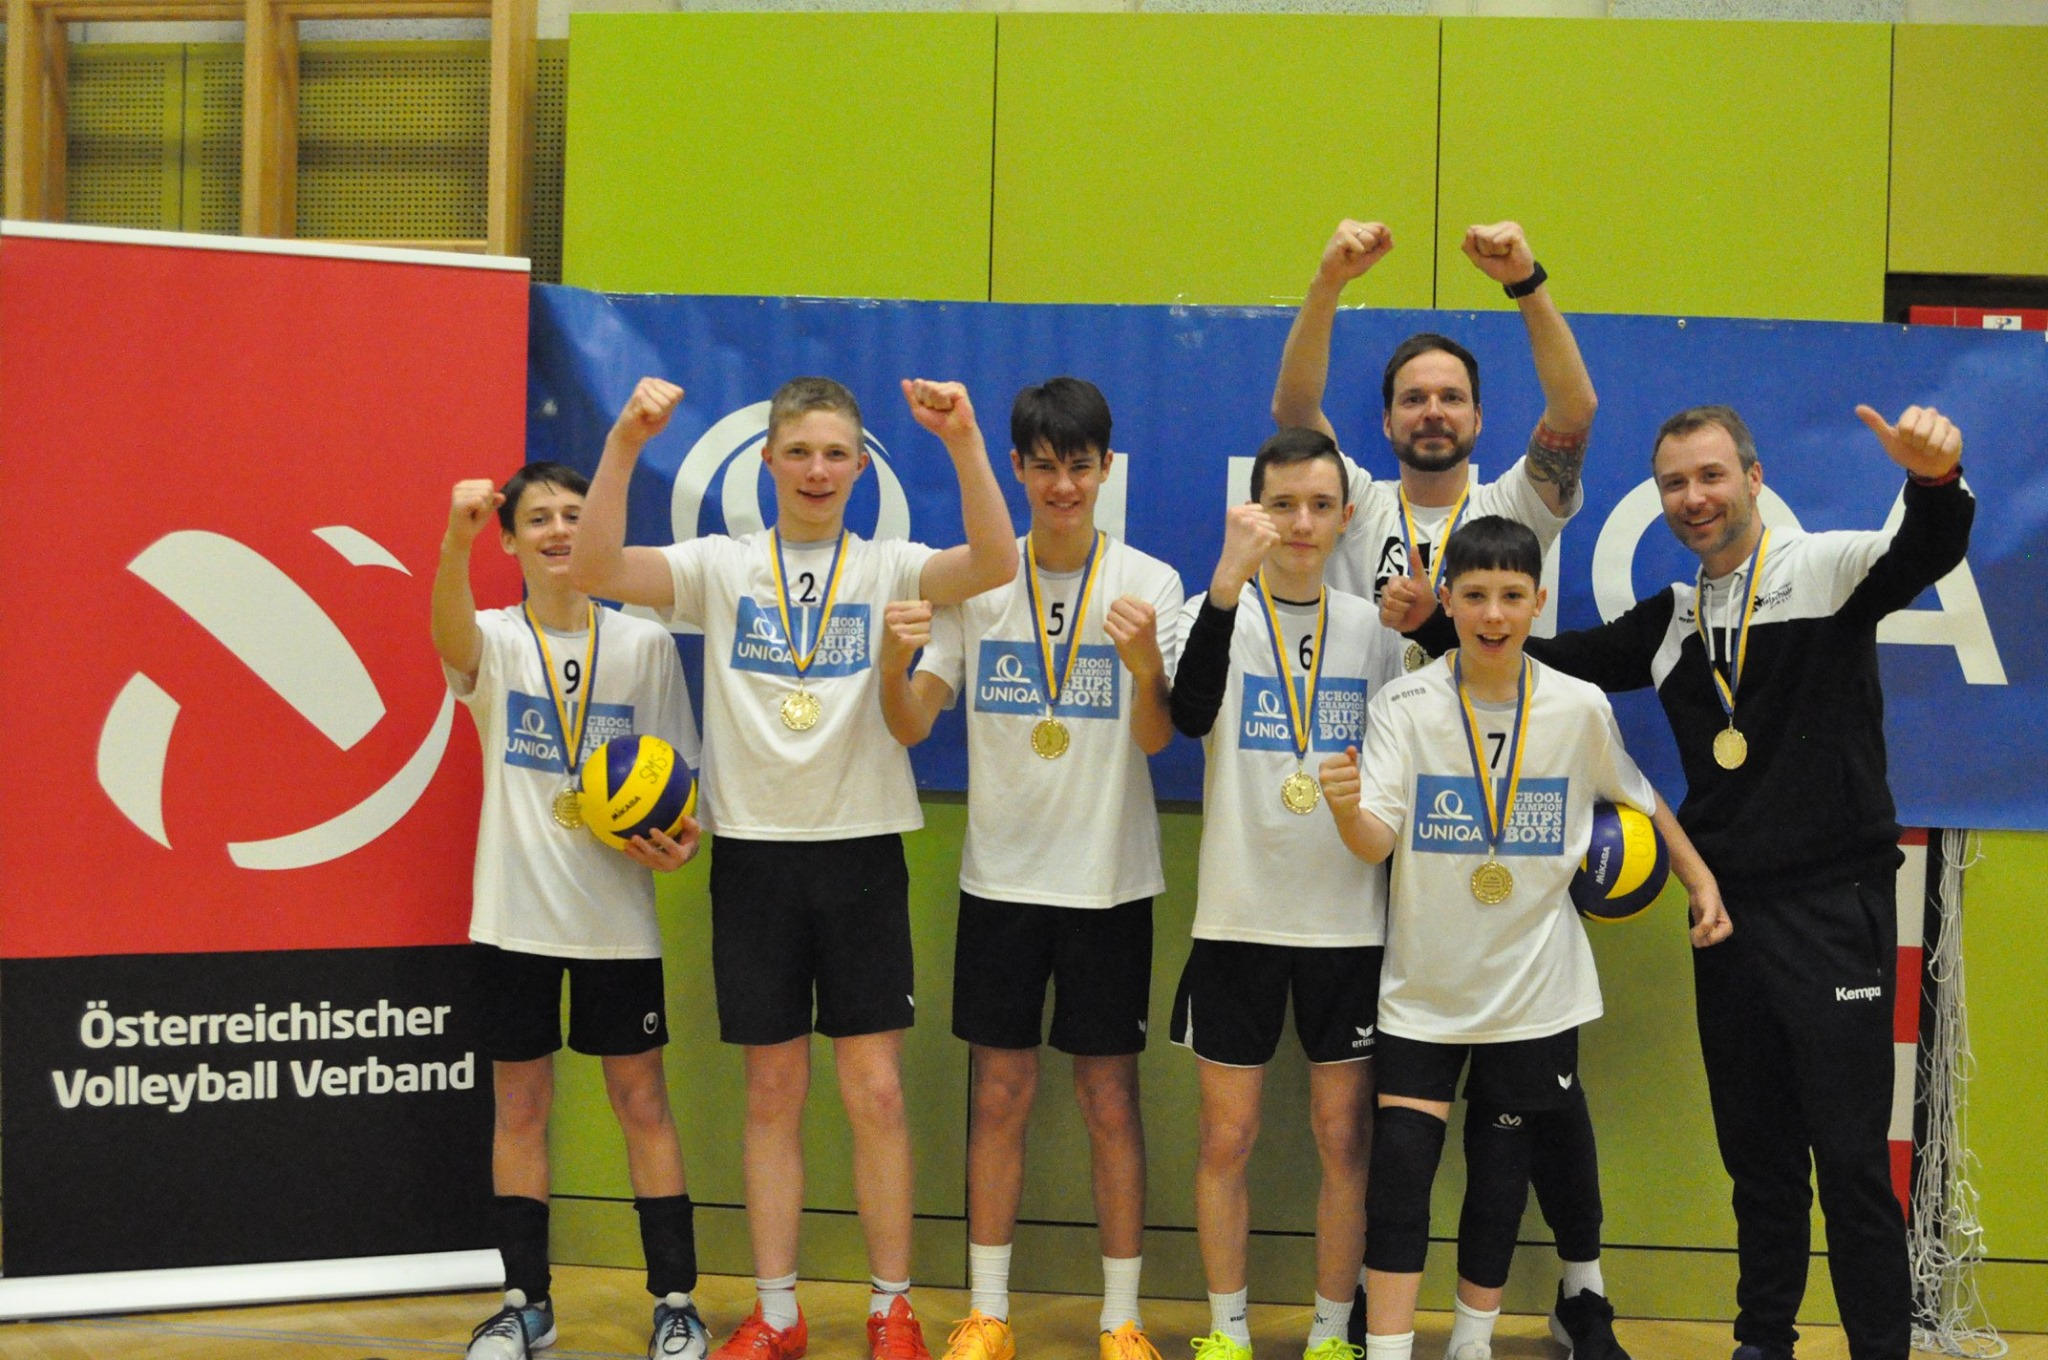 Sportmittelschule Zwettl – Schule der Champions